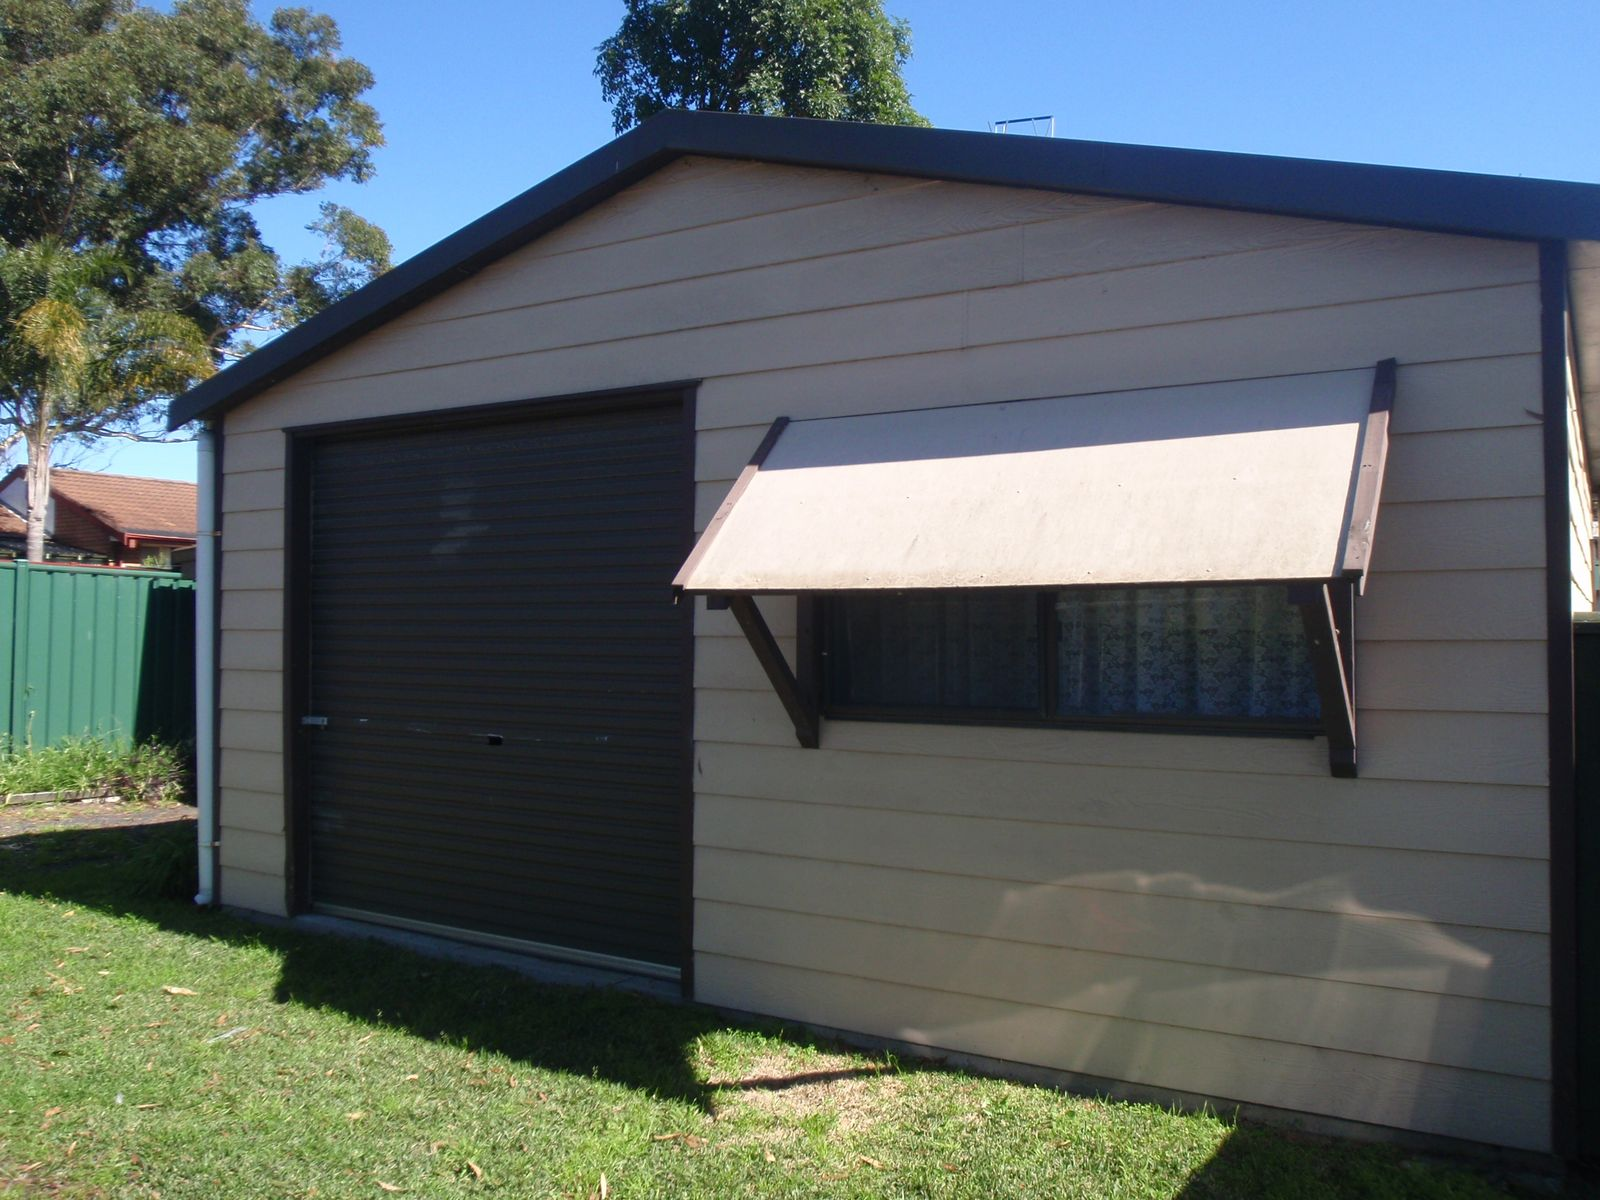 C/94 Springwood Avenue, Ettalong Beach, NSW 2257